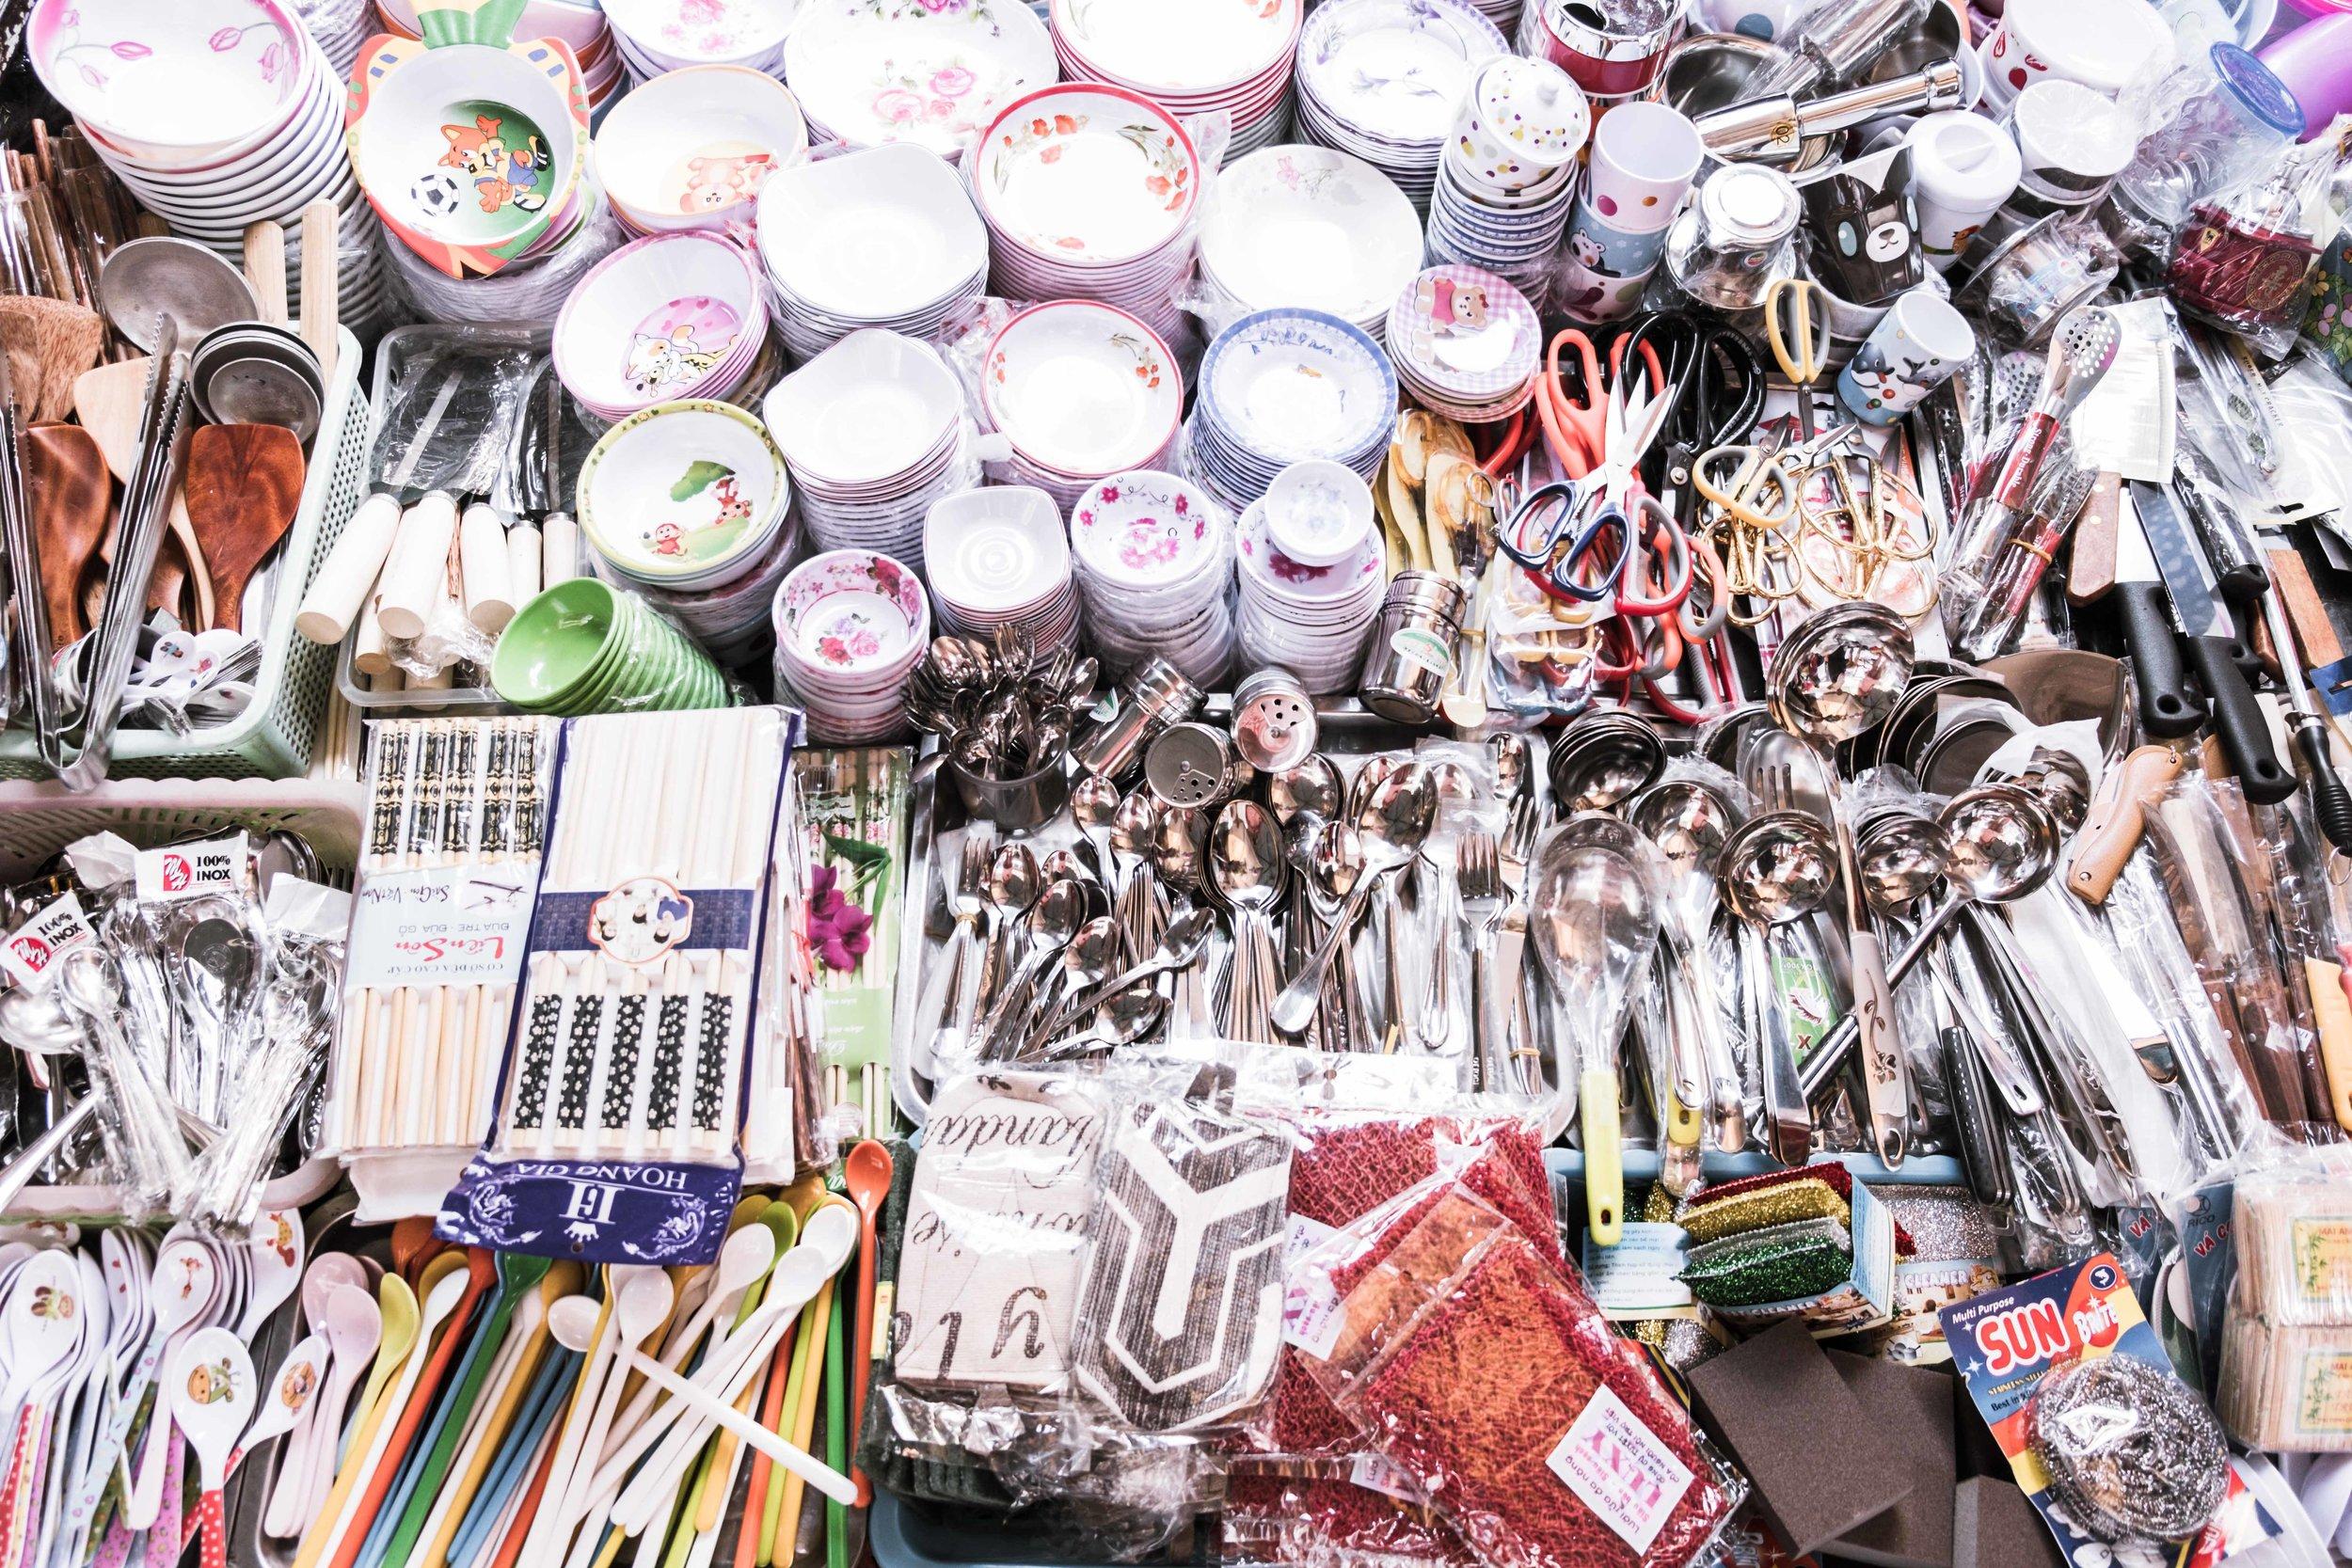 Thai Bin Market, Saigon